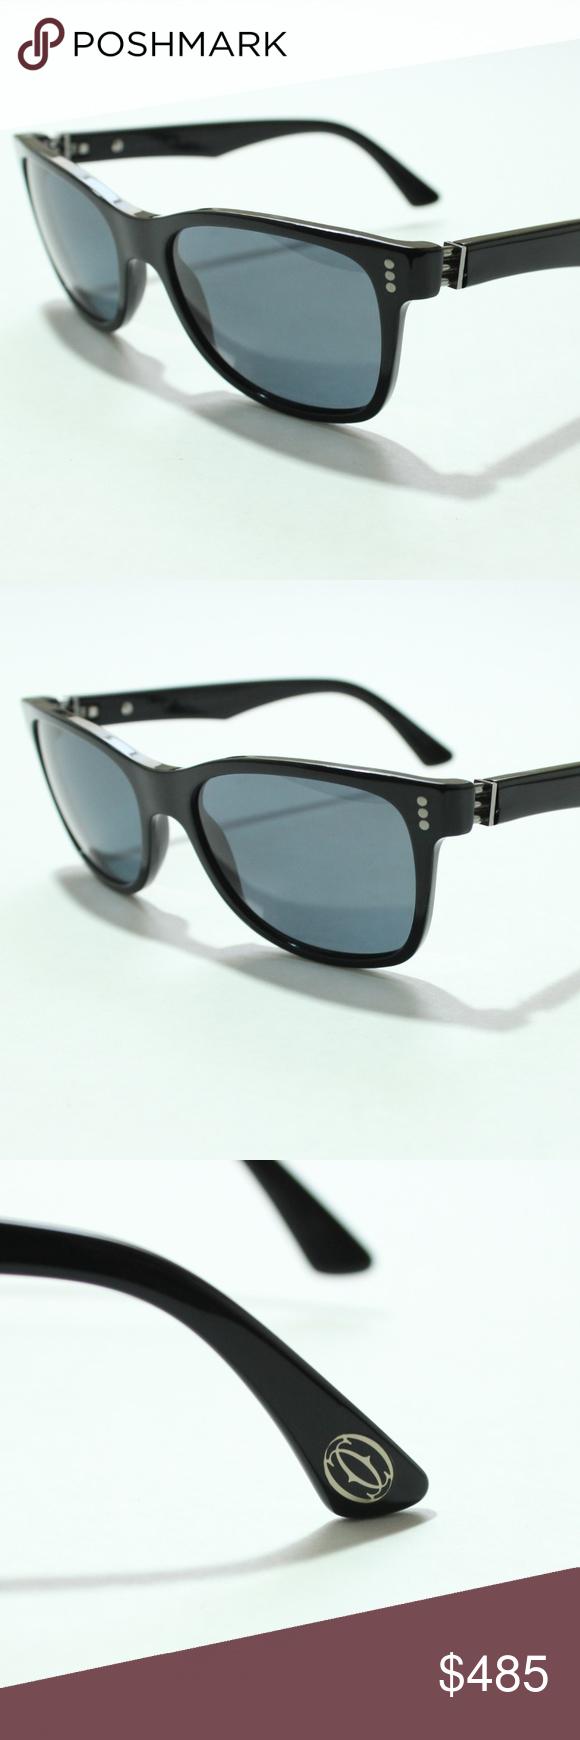 9806da08d6 Cartier Miles Sunglasses Polarized Premiere Collec Cartier Miles Sunglasses  Polarized Collection Premiere (USED